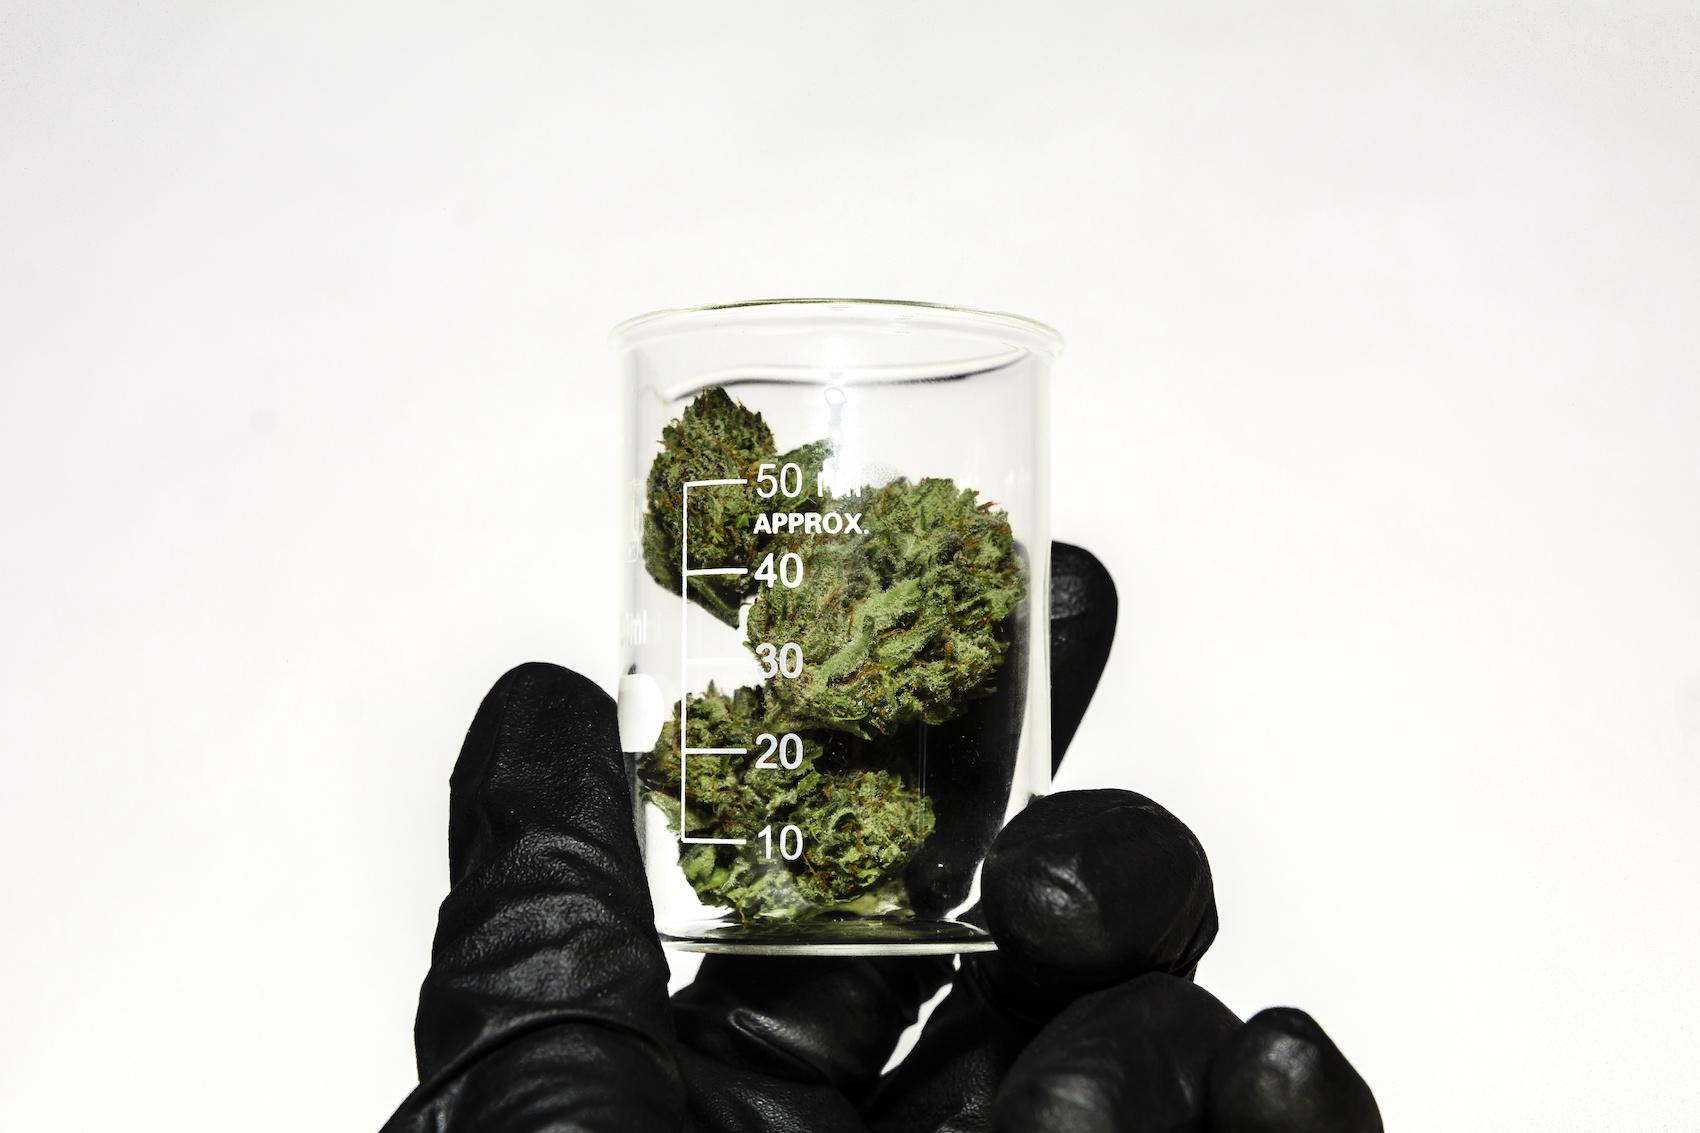 Marijuana flower in drug test jar